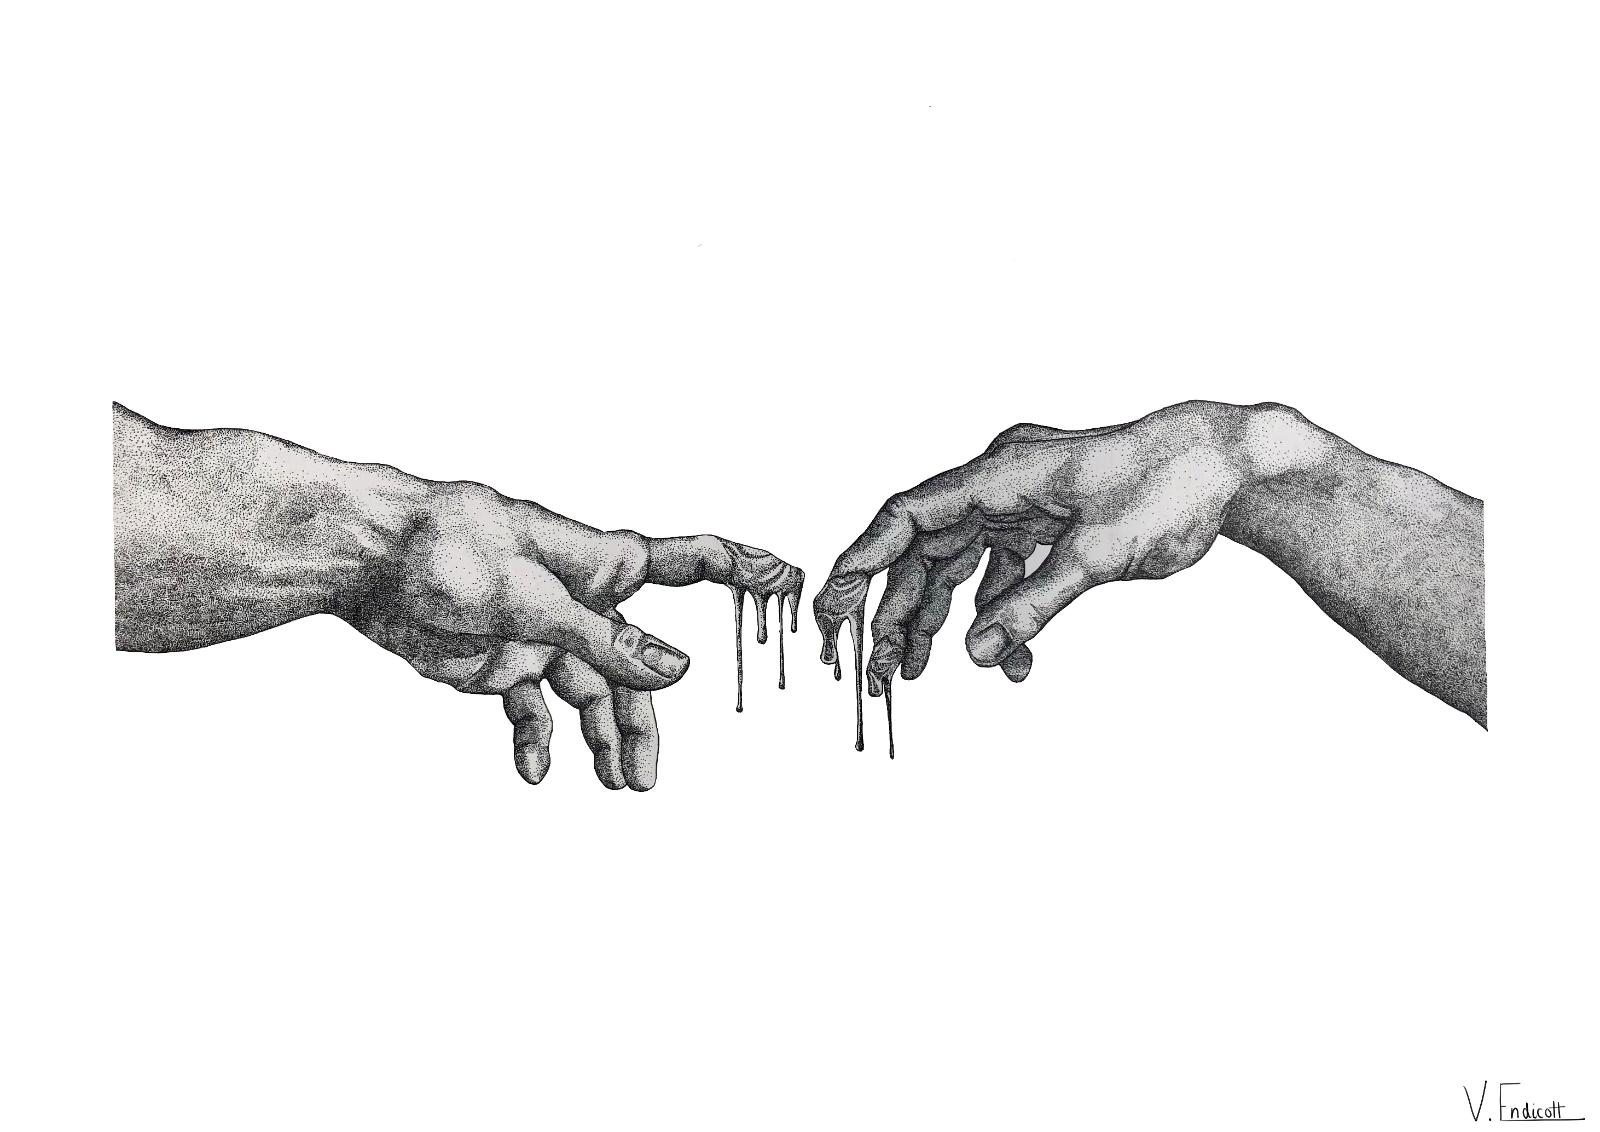 The drip